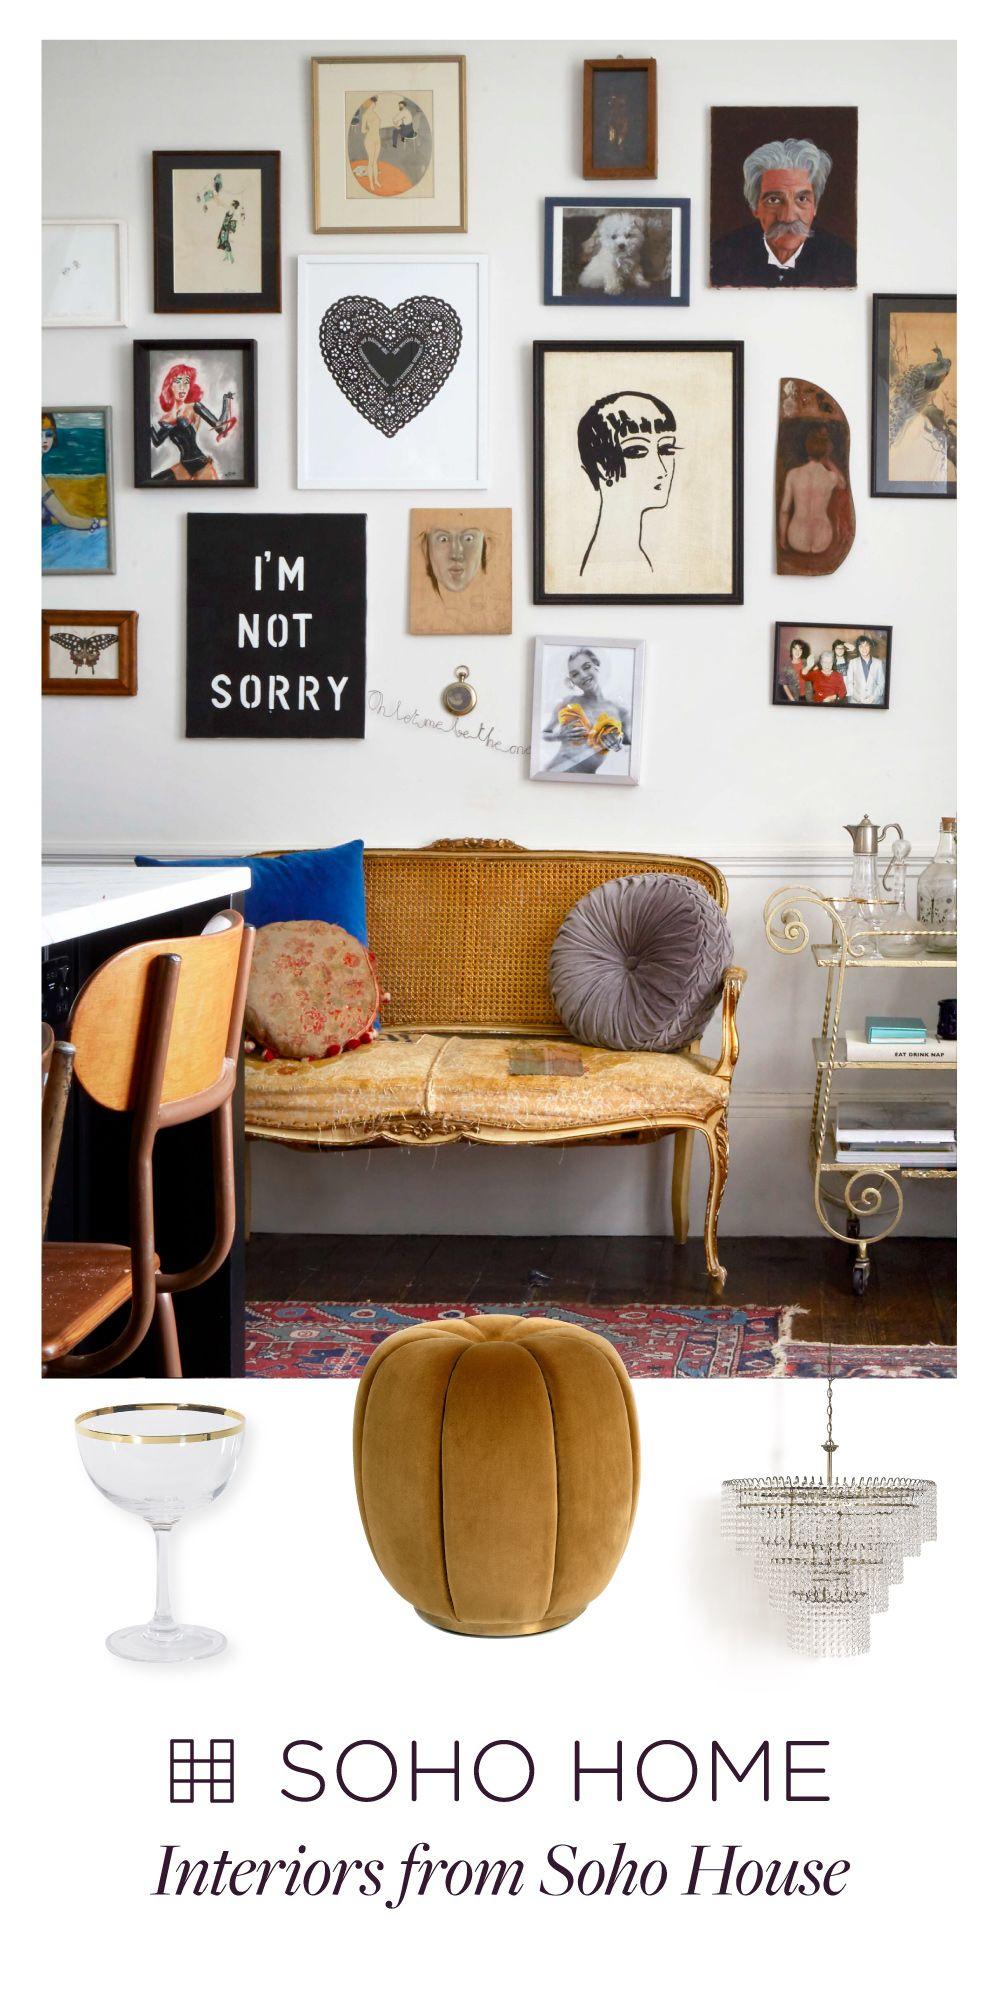 Soho Home Interiors By Soho House Shop Furniture Textiles And Glassware House Interior Home Living Room Interior Design